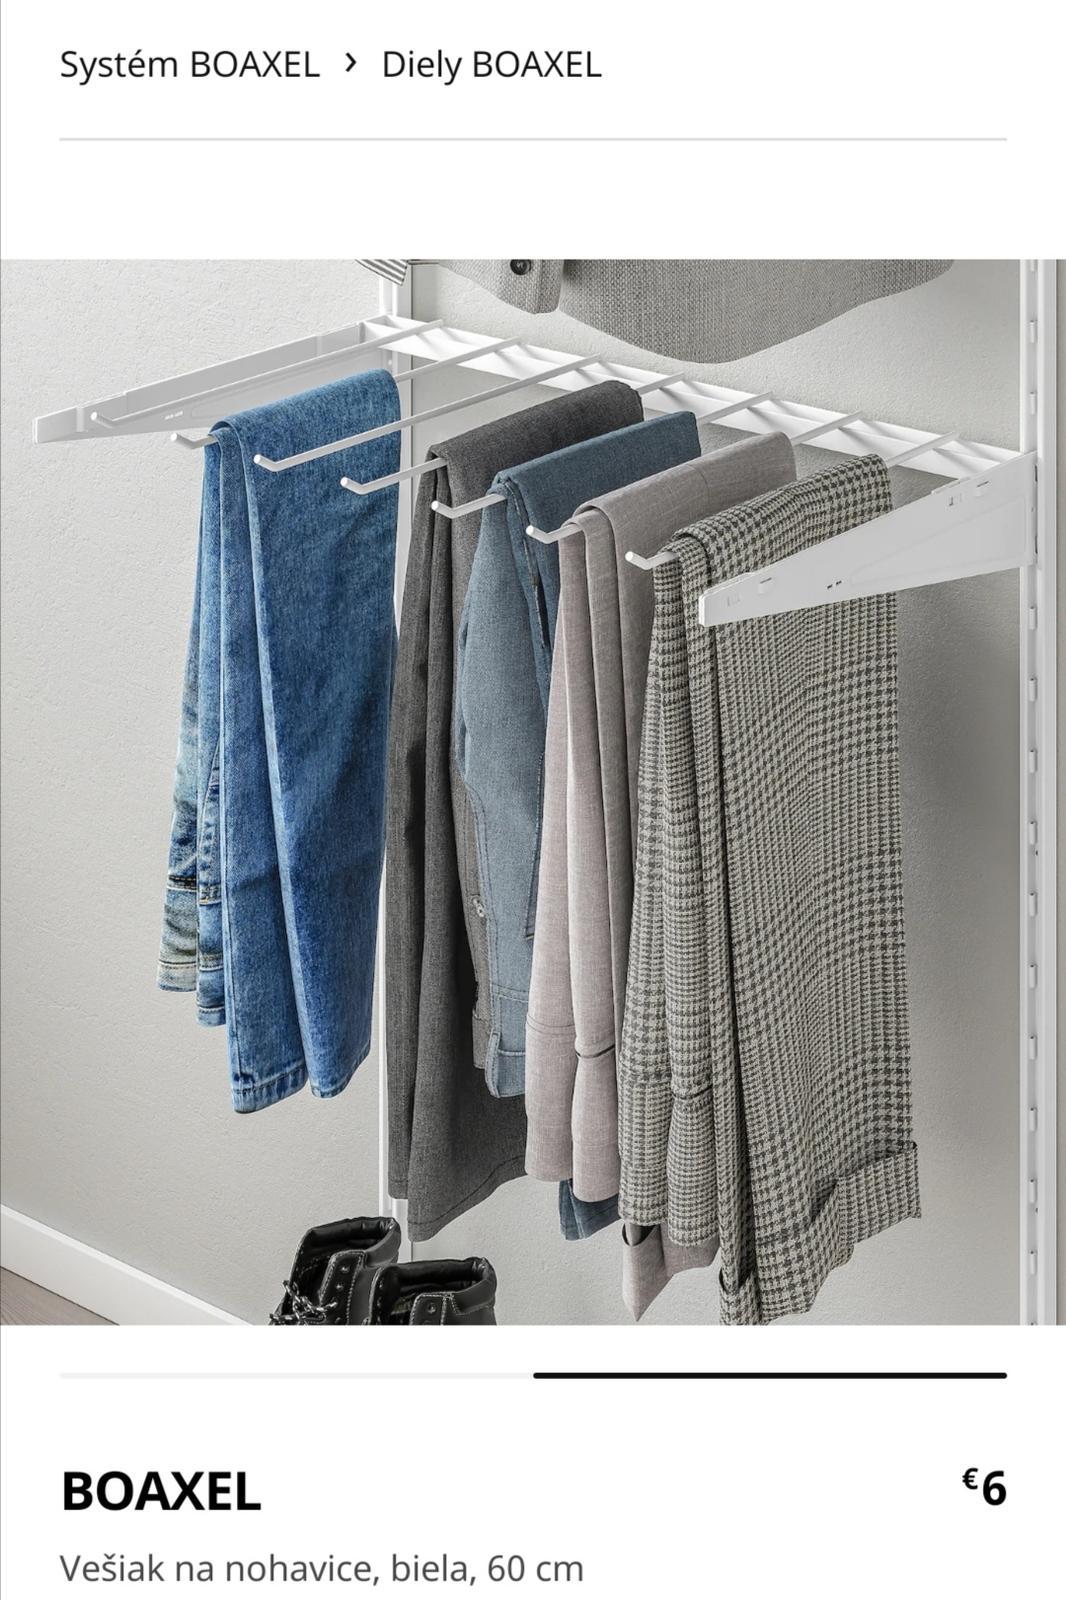 IKEA Boaxel konzola 2x a vesiak na nohavice 1x - Obrázok č. 1